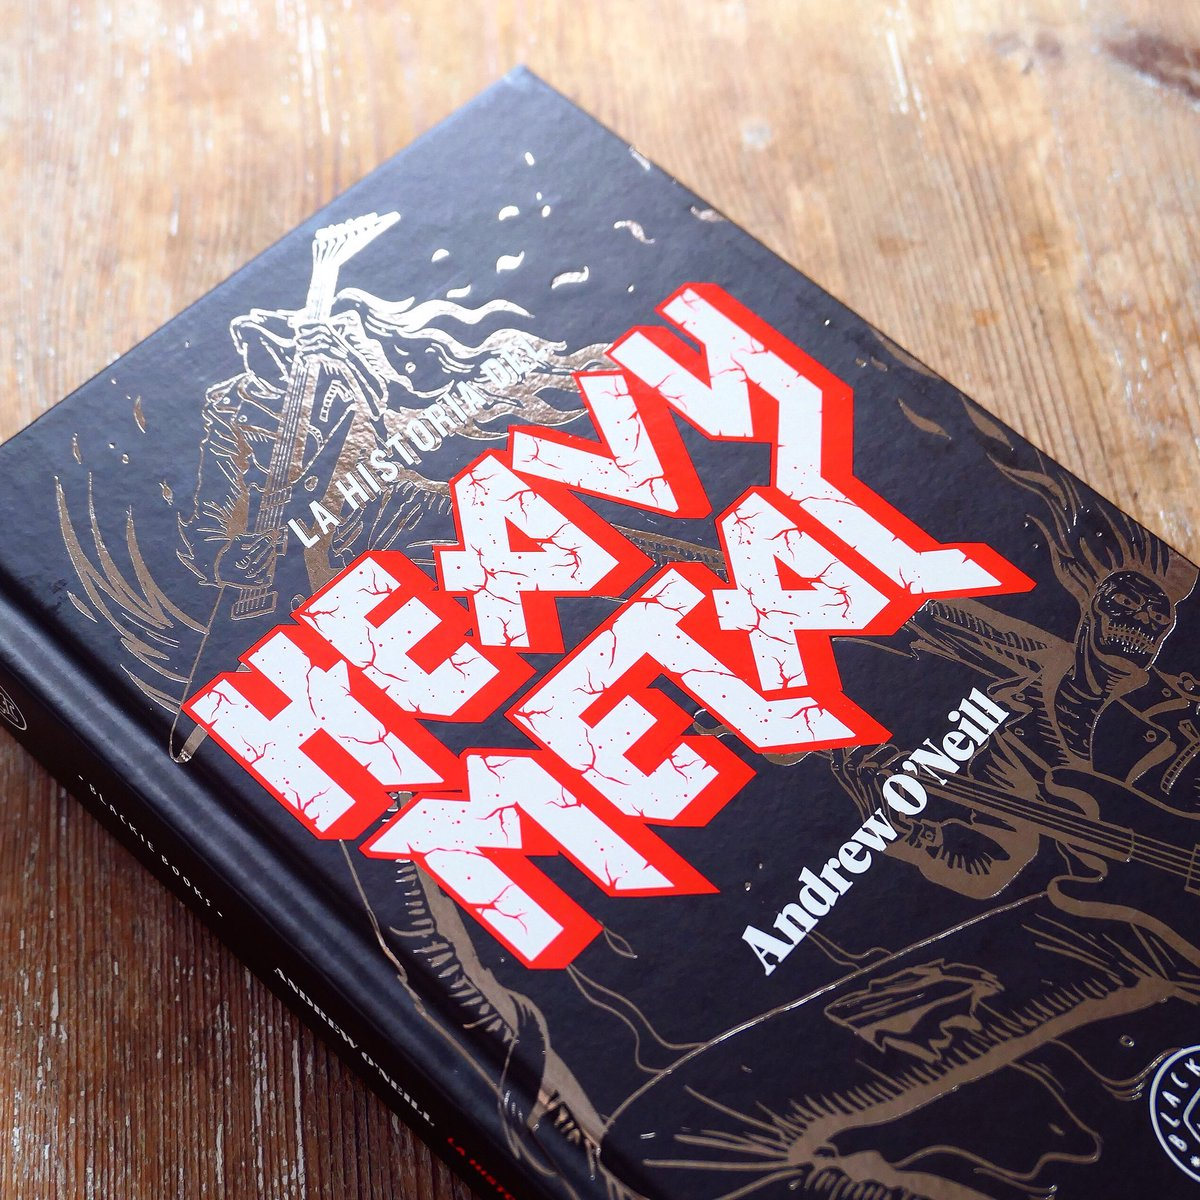 heavy metal historia